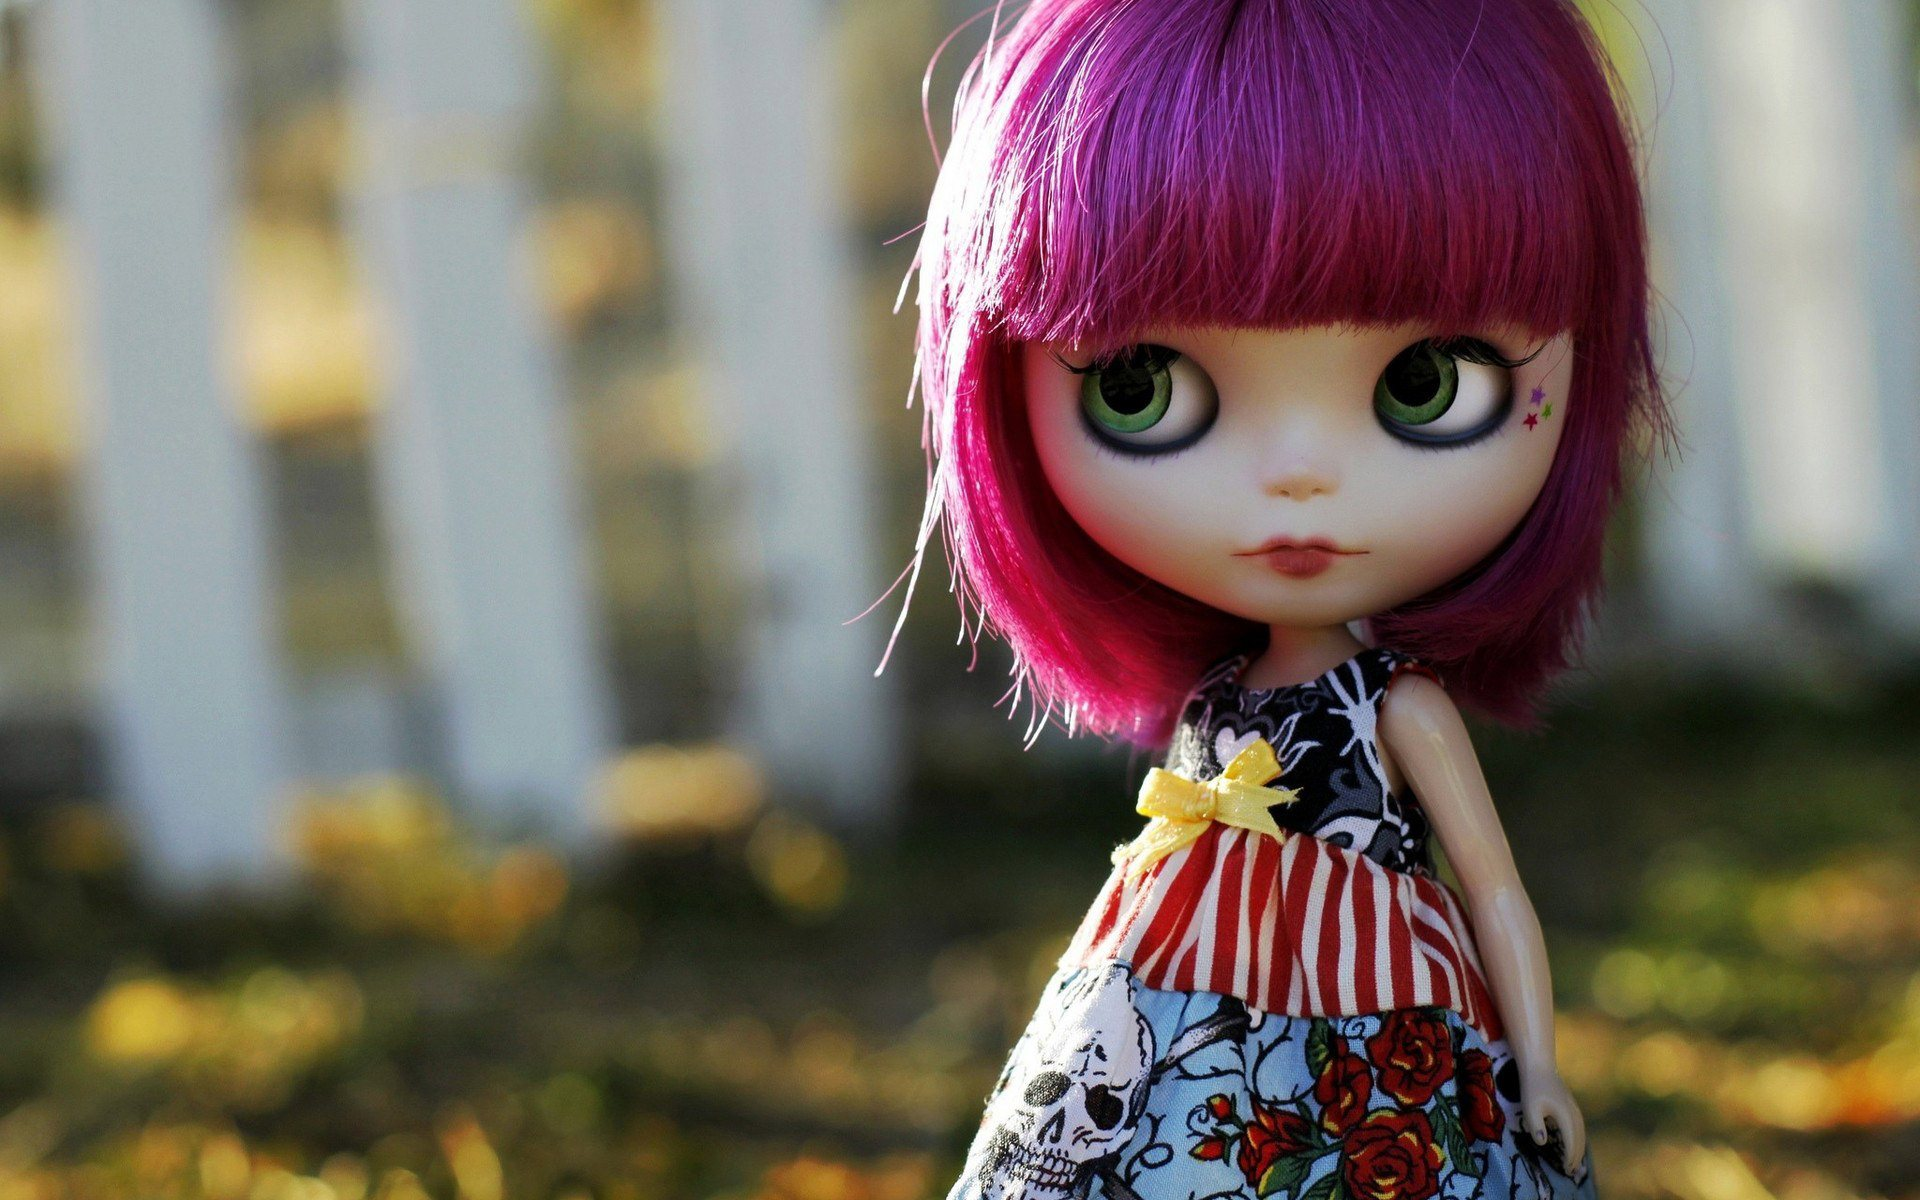 Cute-Doll-Wallpaper.jpg